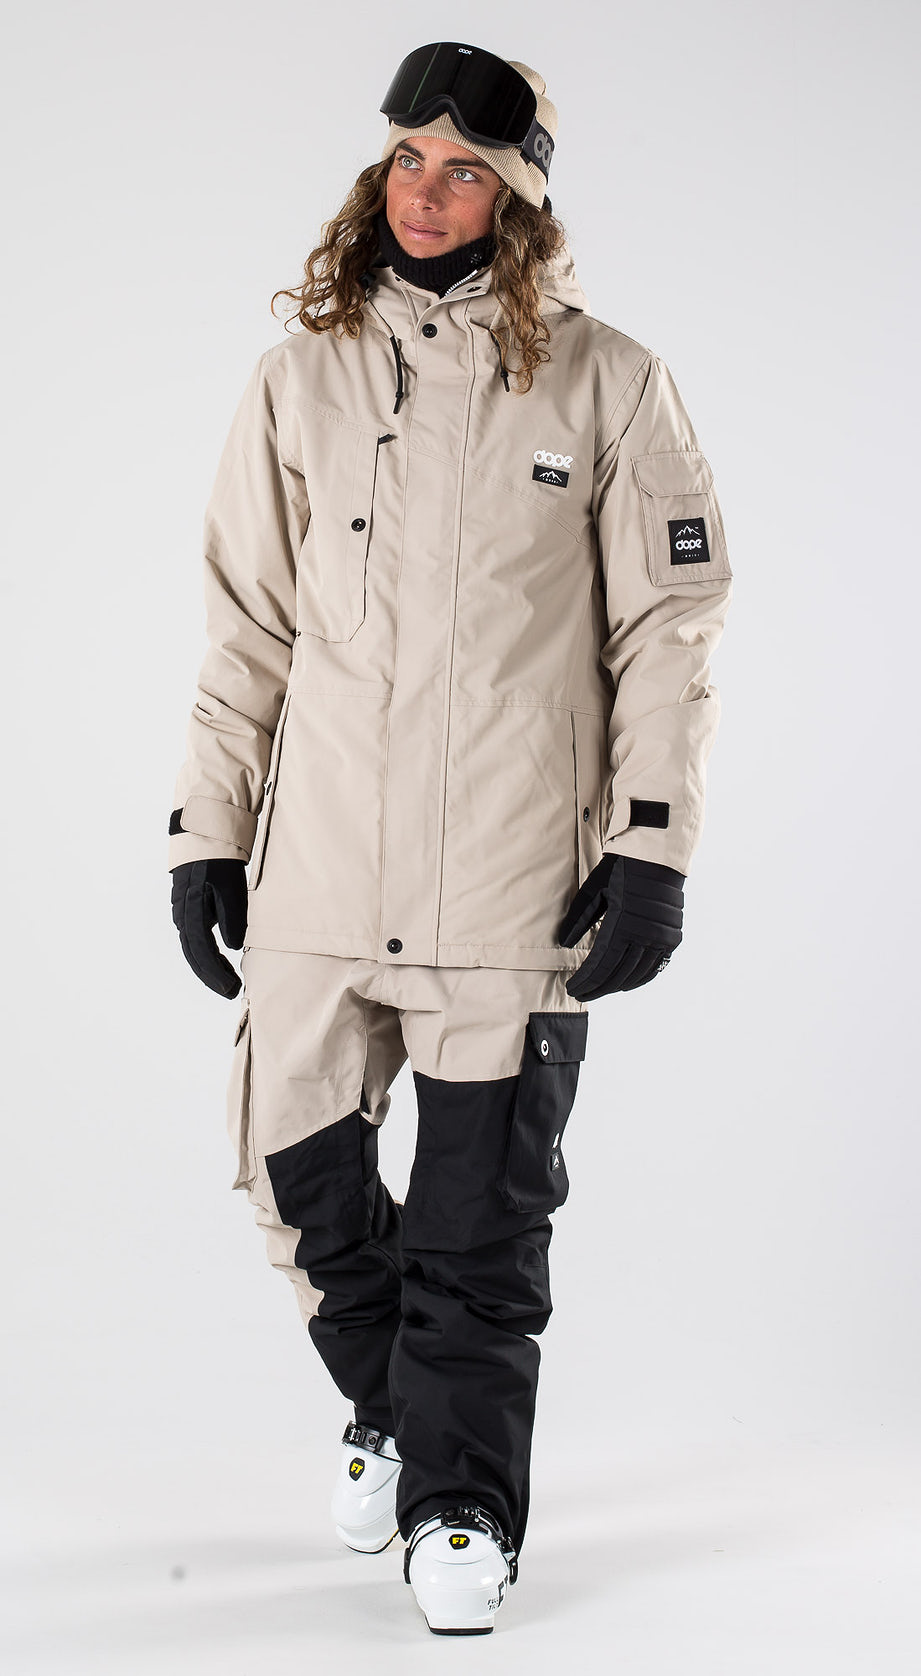 Dope Adept Sand Ski clothing Multi